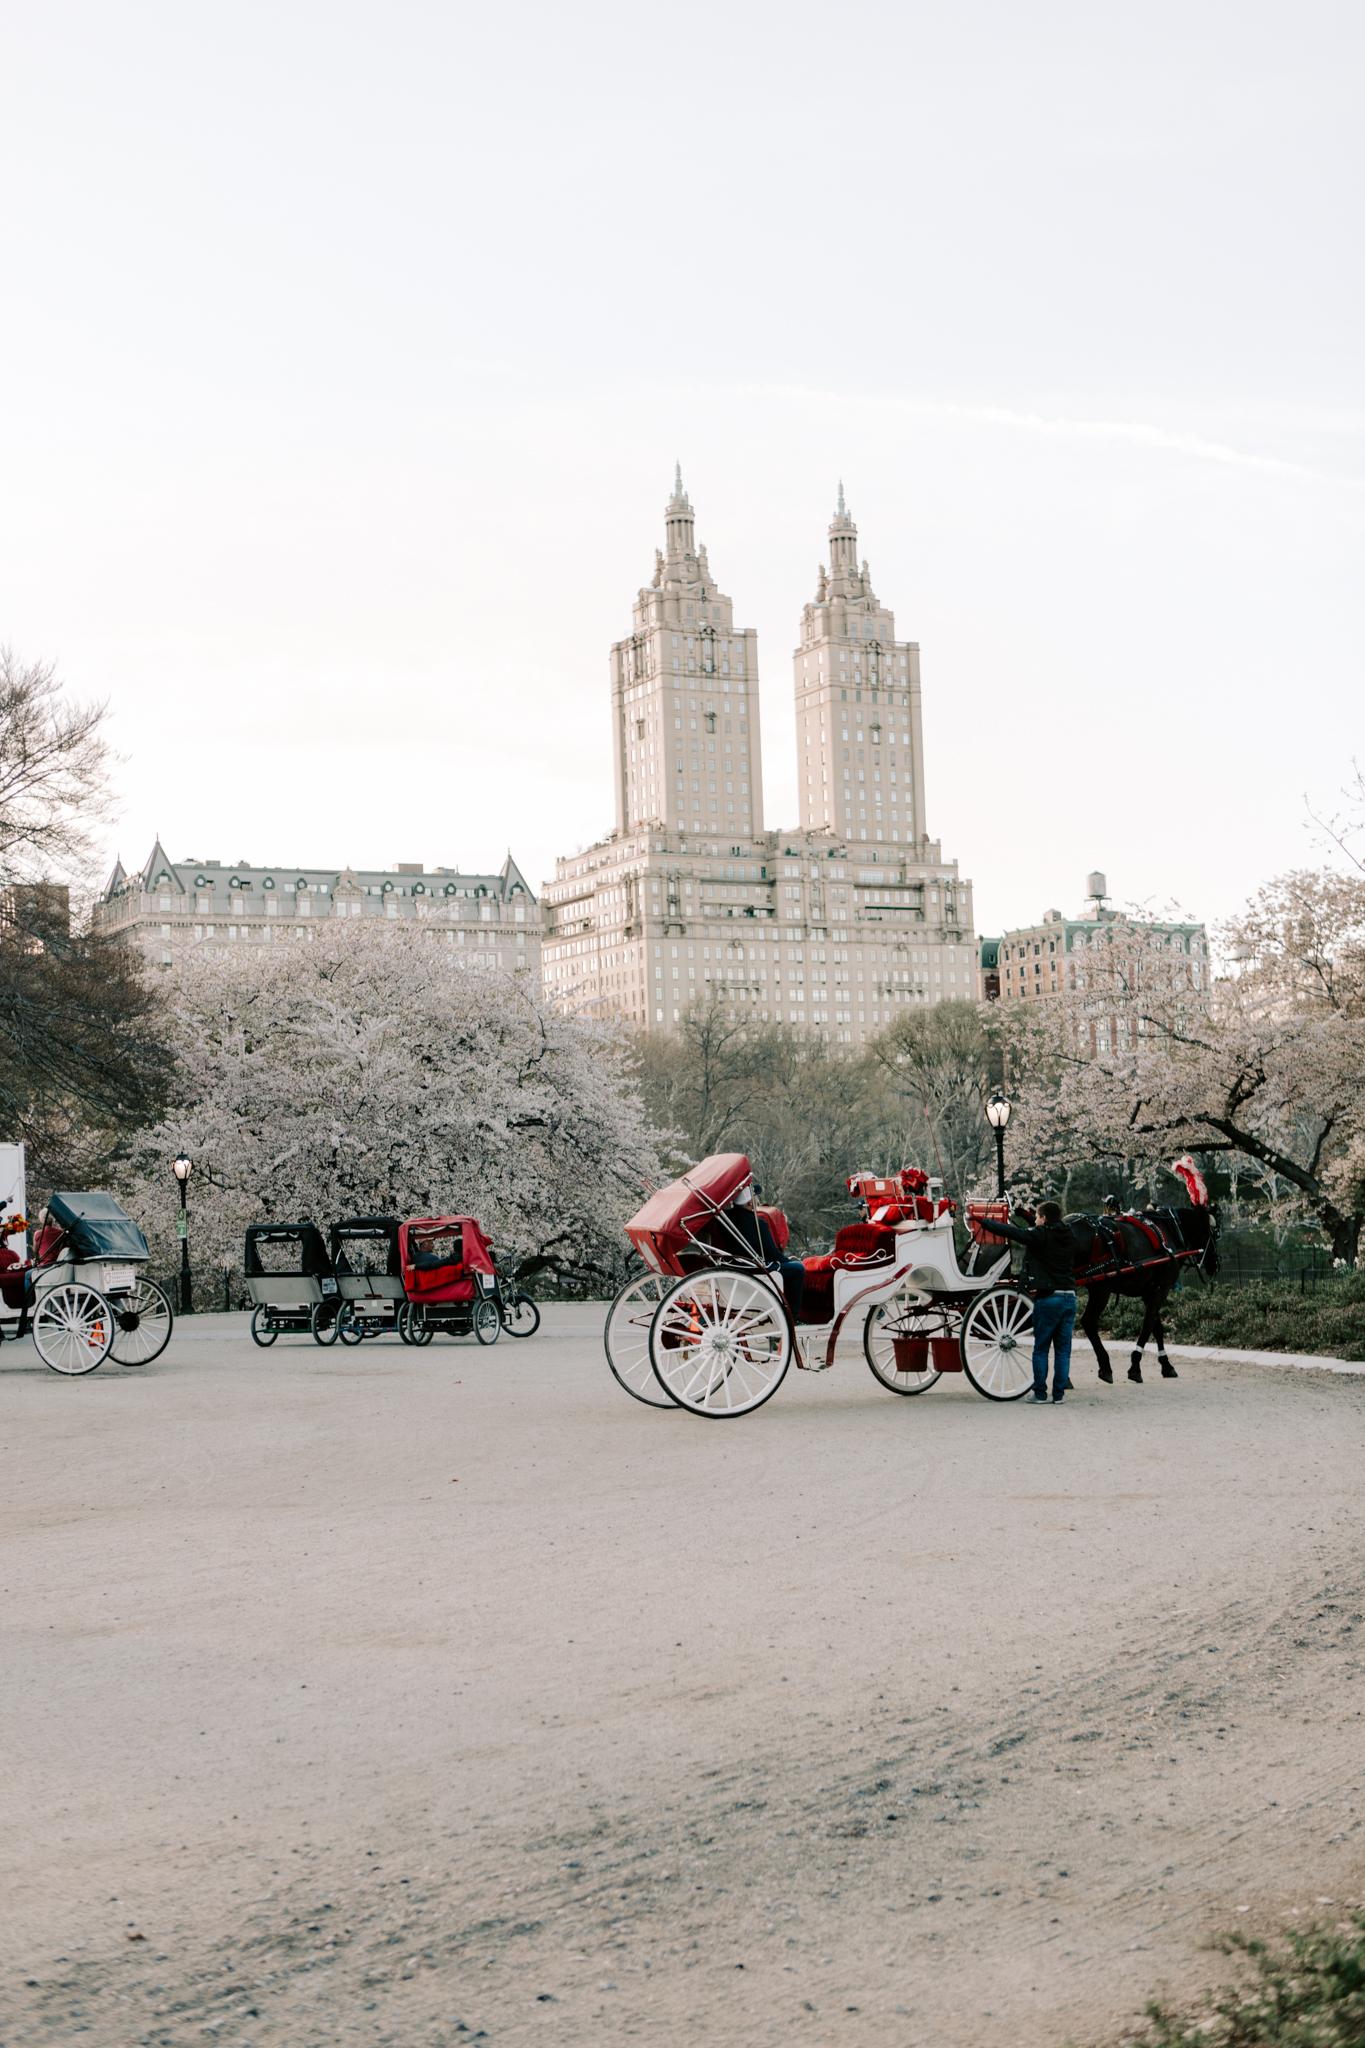 Central Park Horse Carriages